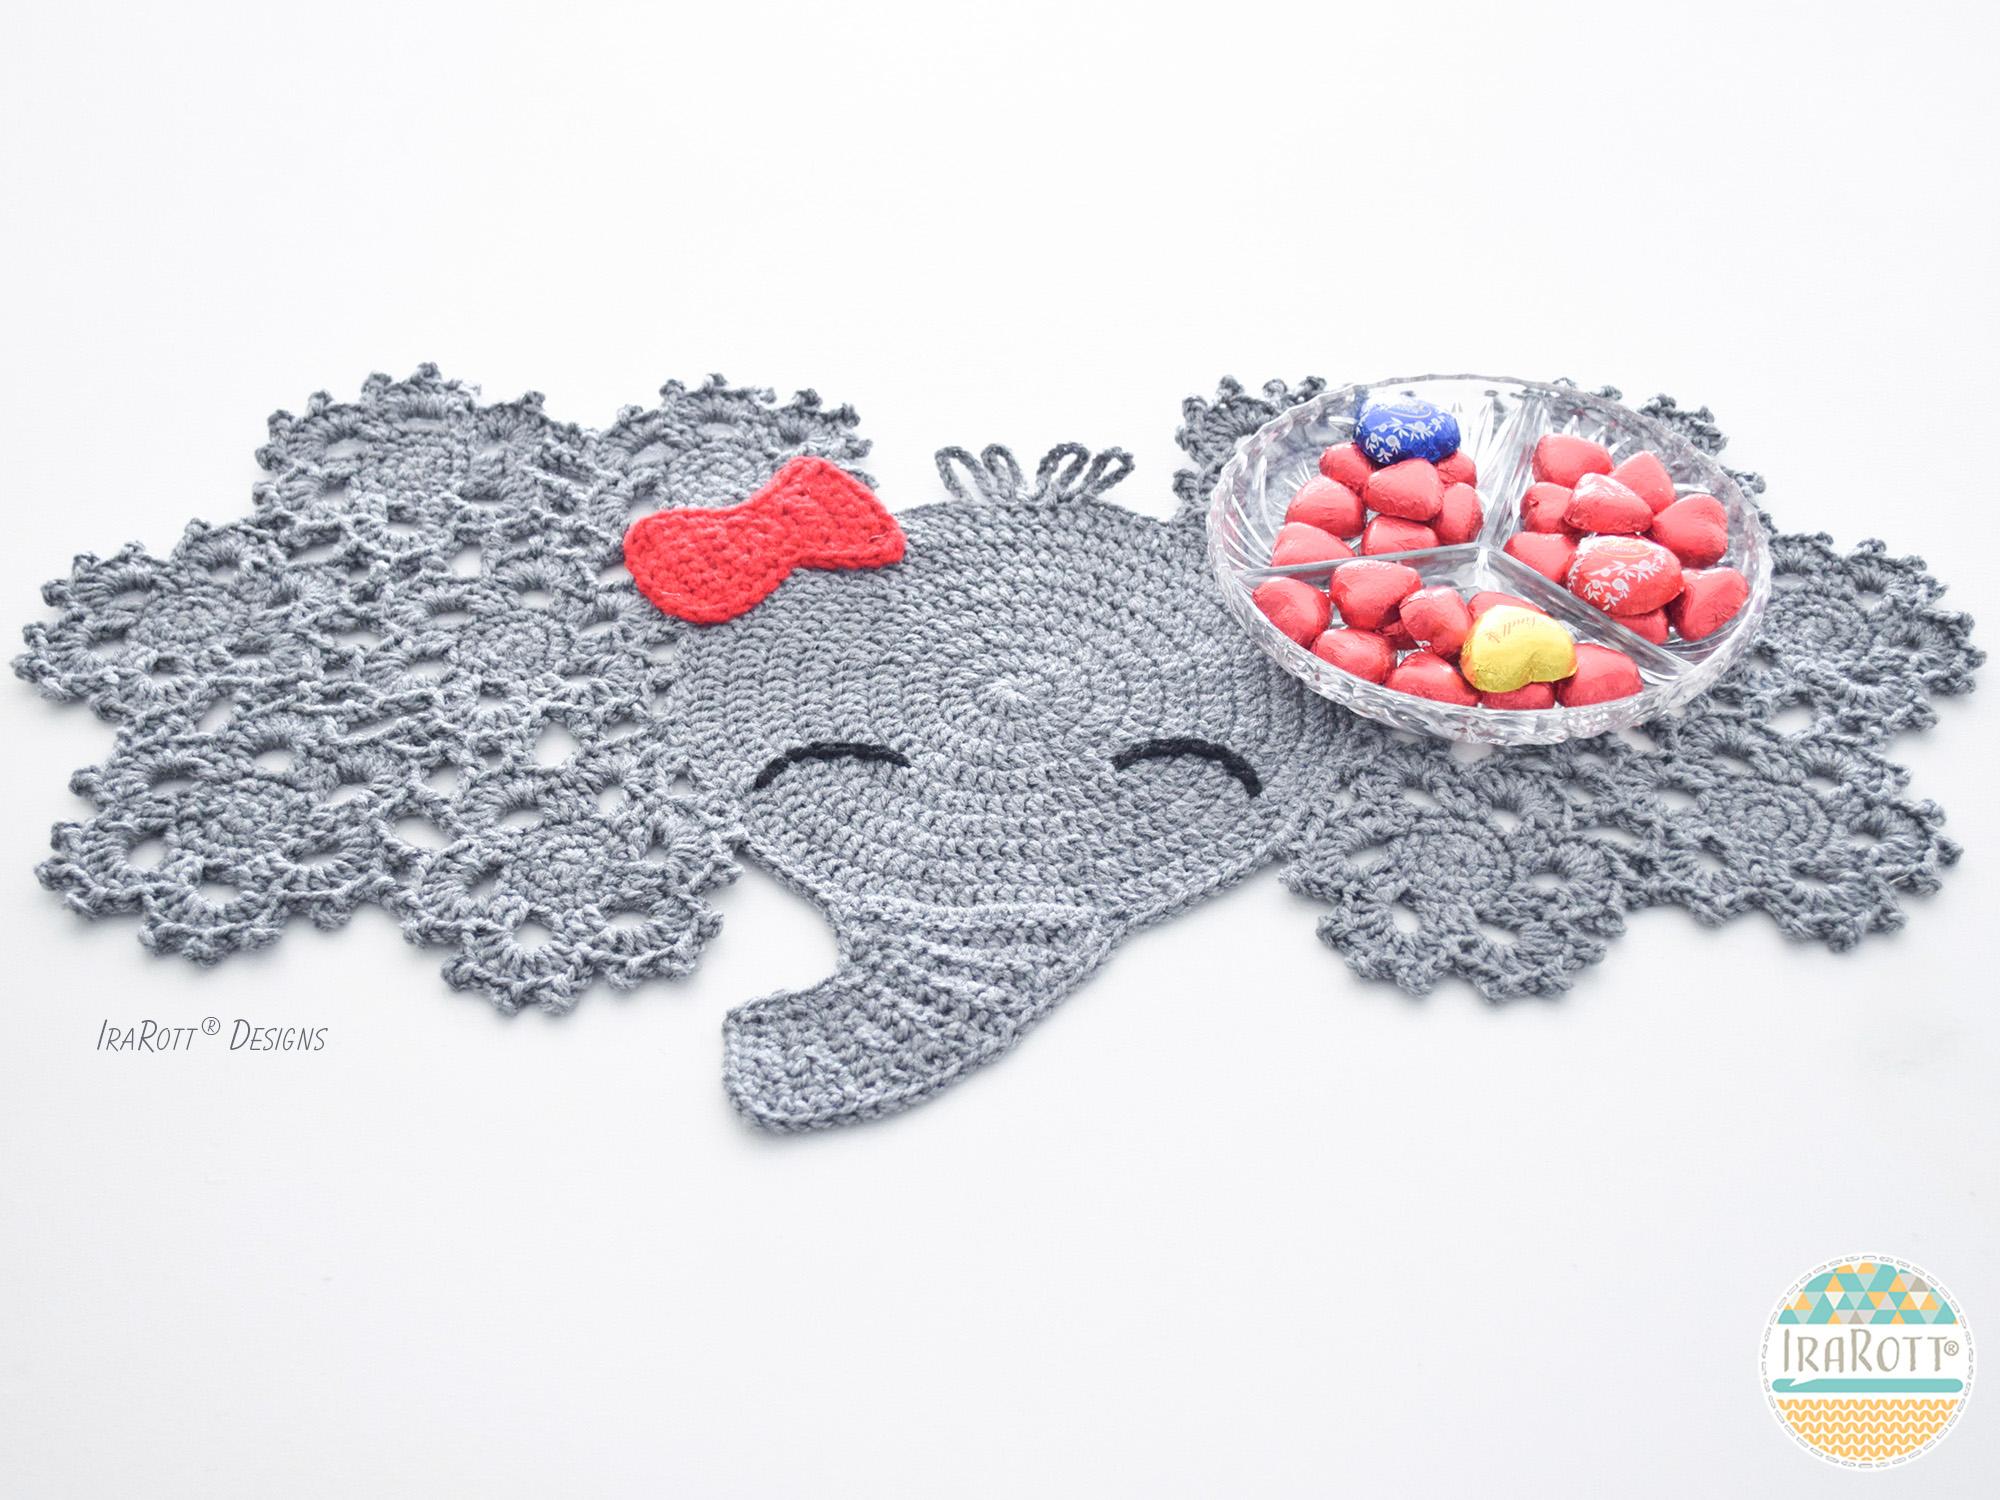 Inspiration! 20 Crochet Elephants! – Crochet Patterns, How to ... | 1500x2000